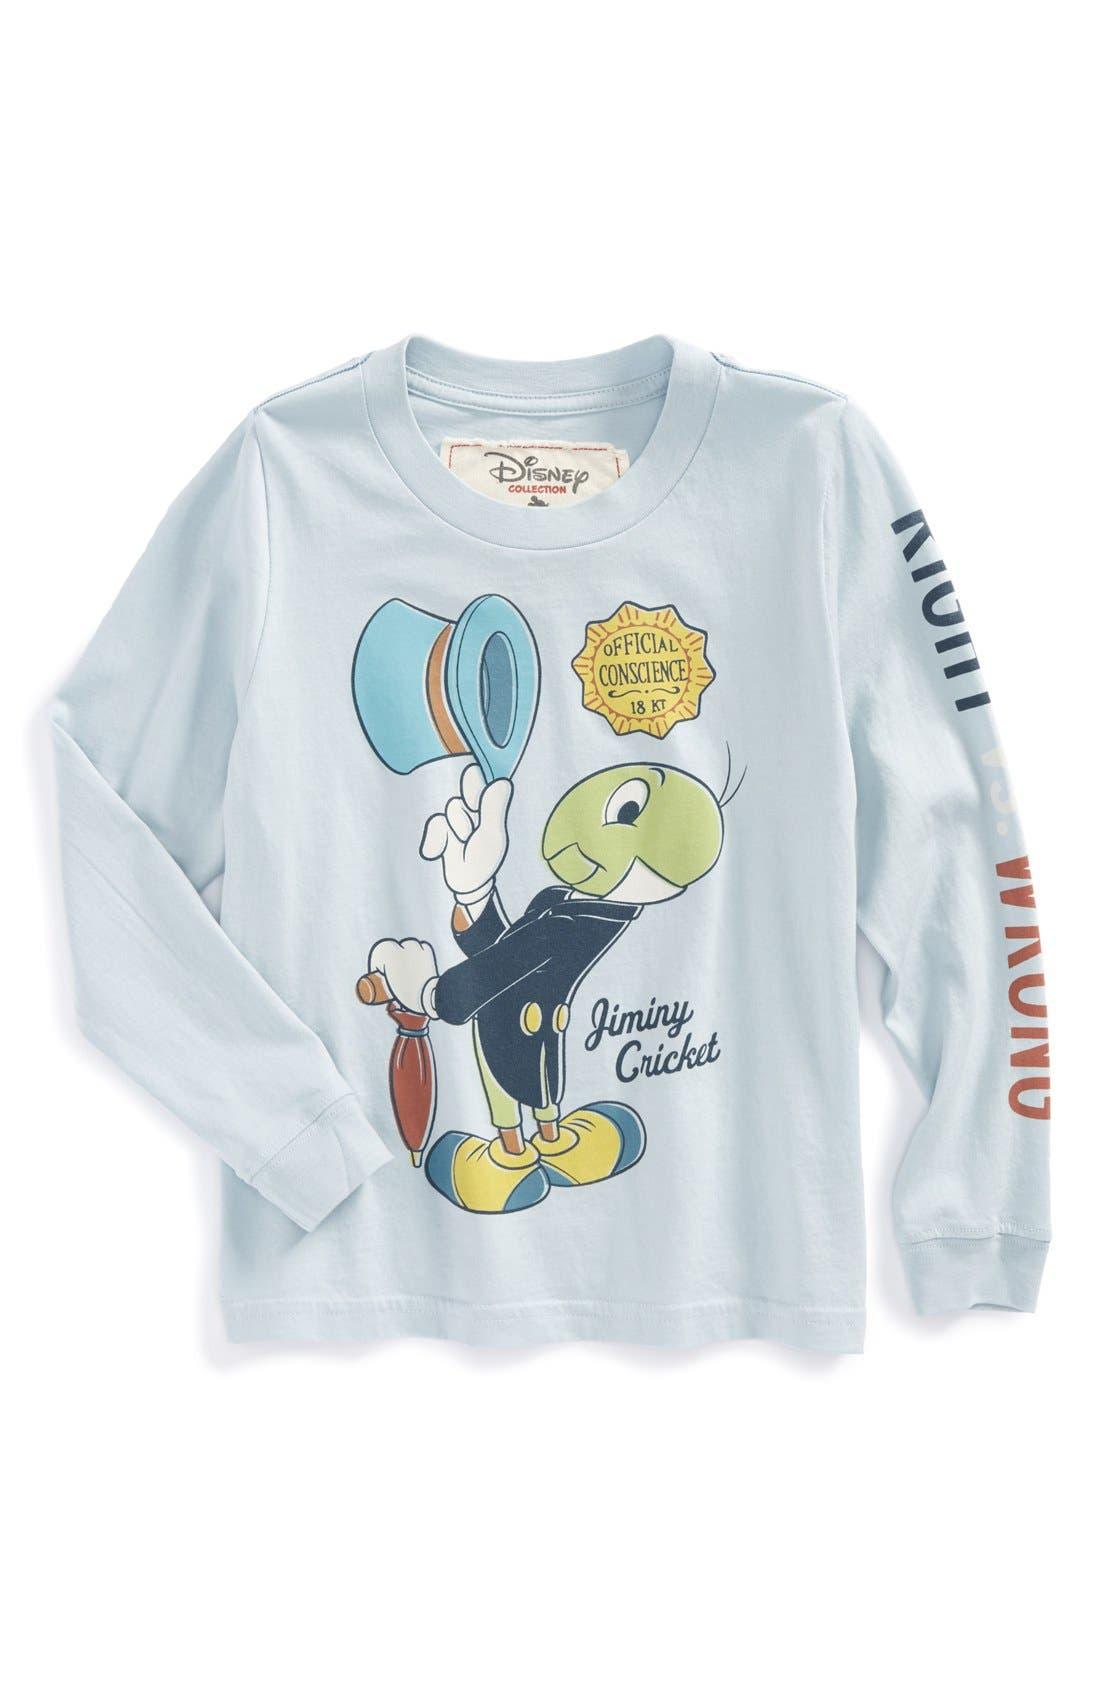 Alternate Image 1 Selected - Peek 'Disney - Jiminy Cricket' Graphic Long Sleeve T-Shirt (Toddler Boys, Little Boys & Big Boys)